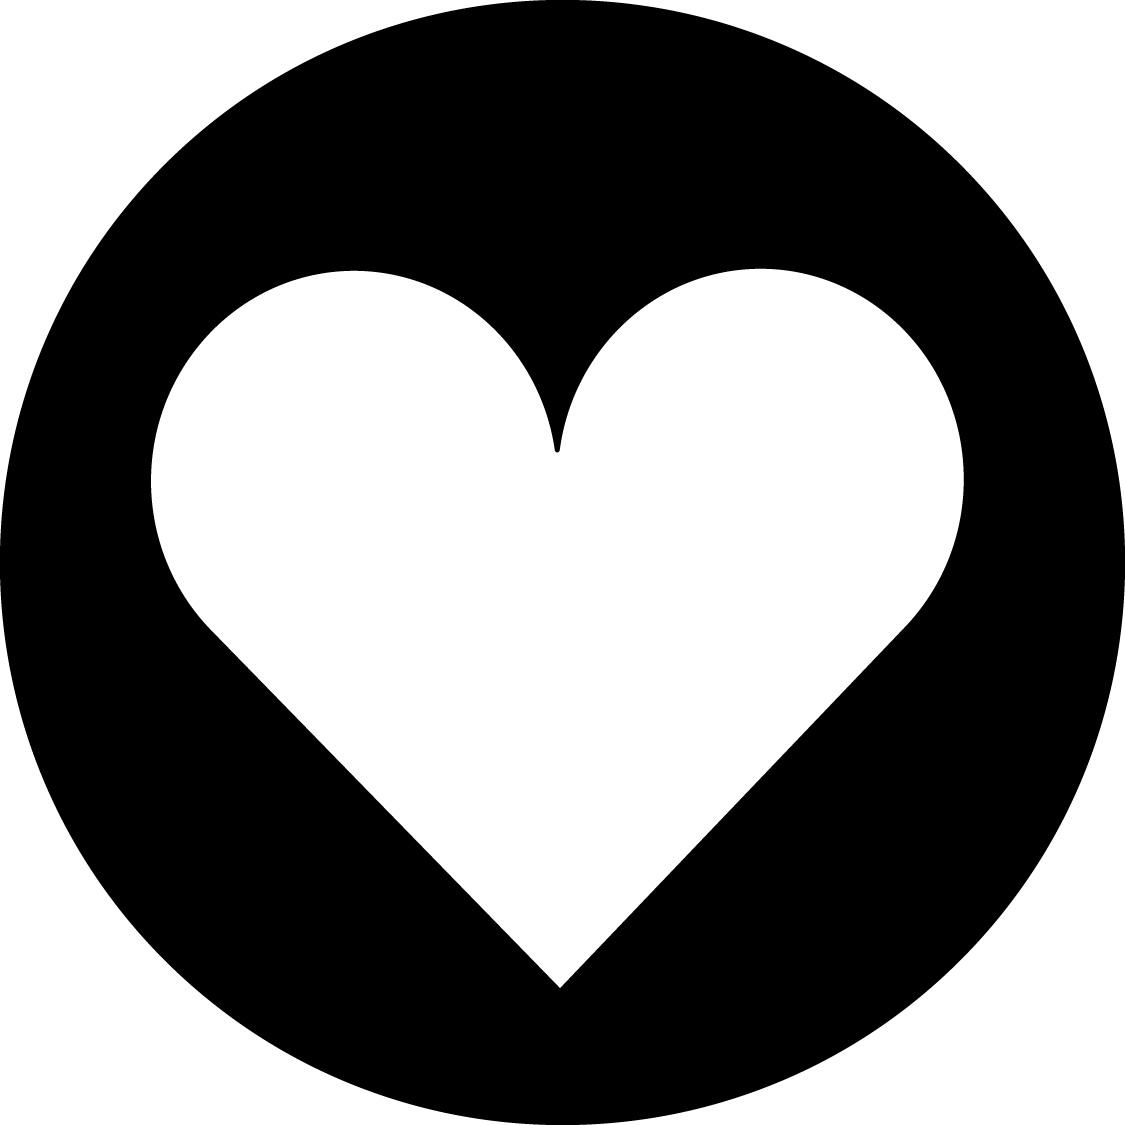 Black And White Heart Wallpaper - WallpaperSafari